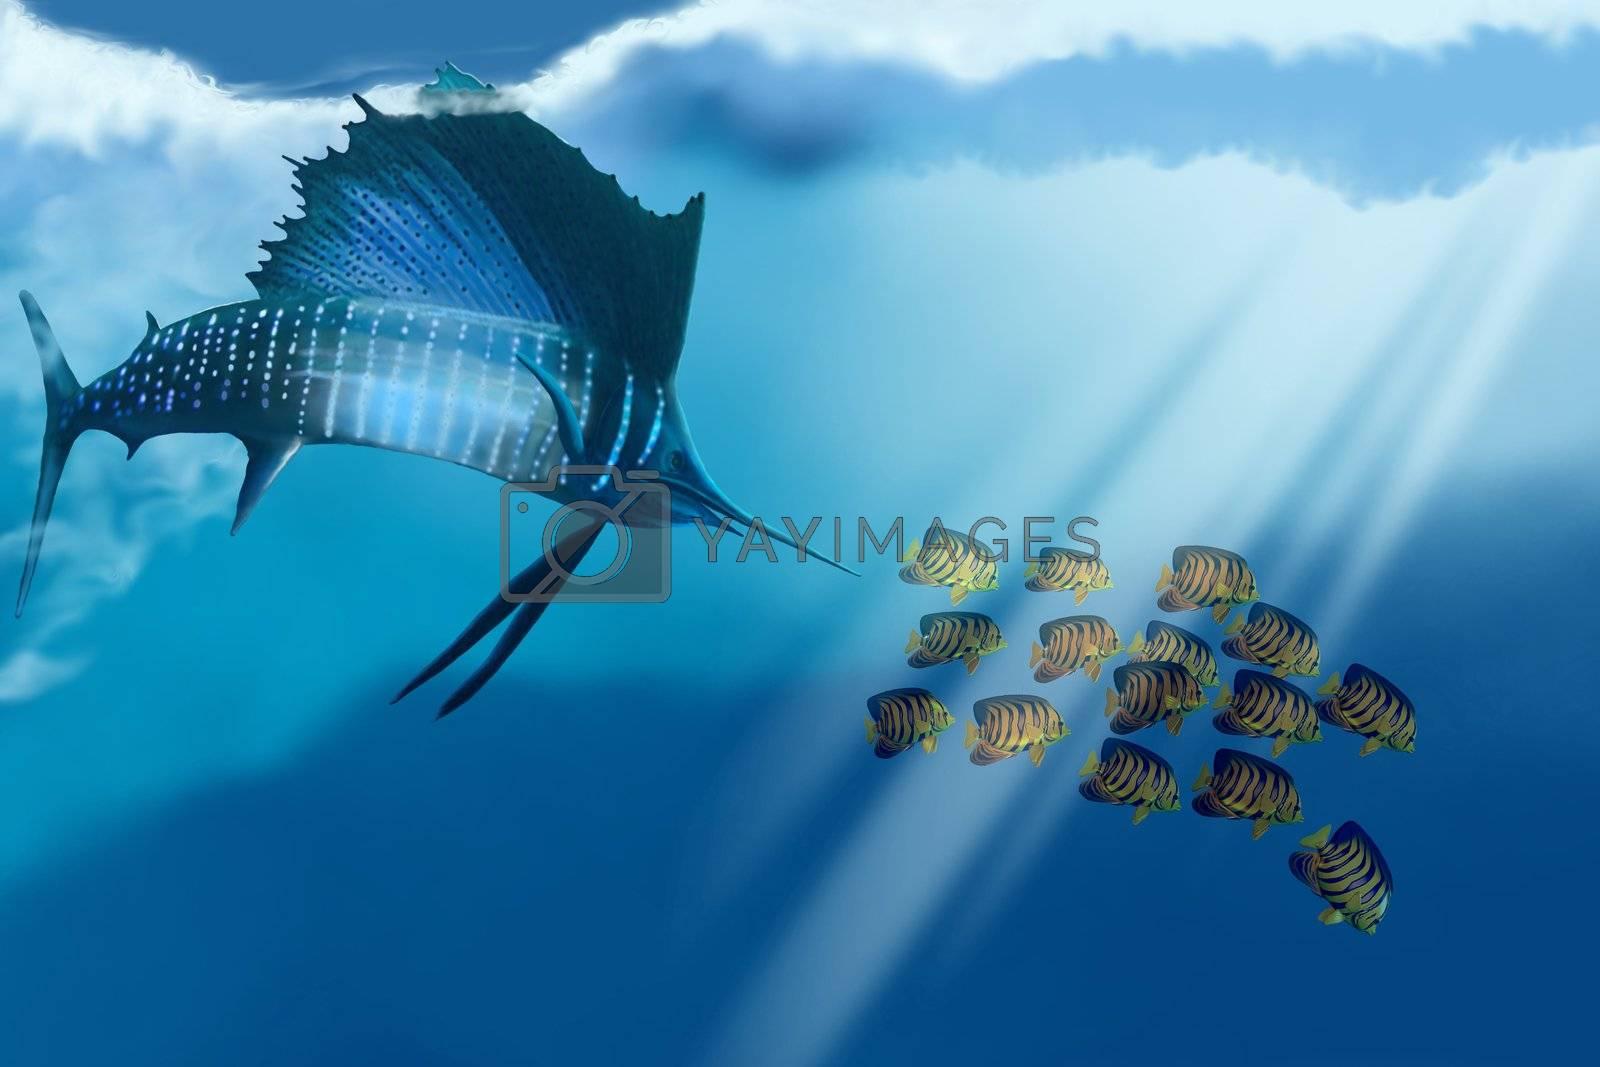 A sailfish swims after its prey.